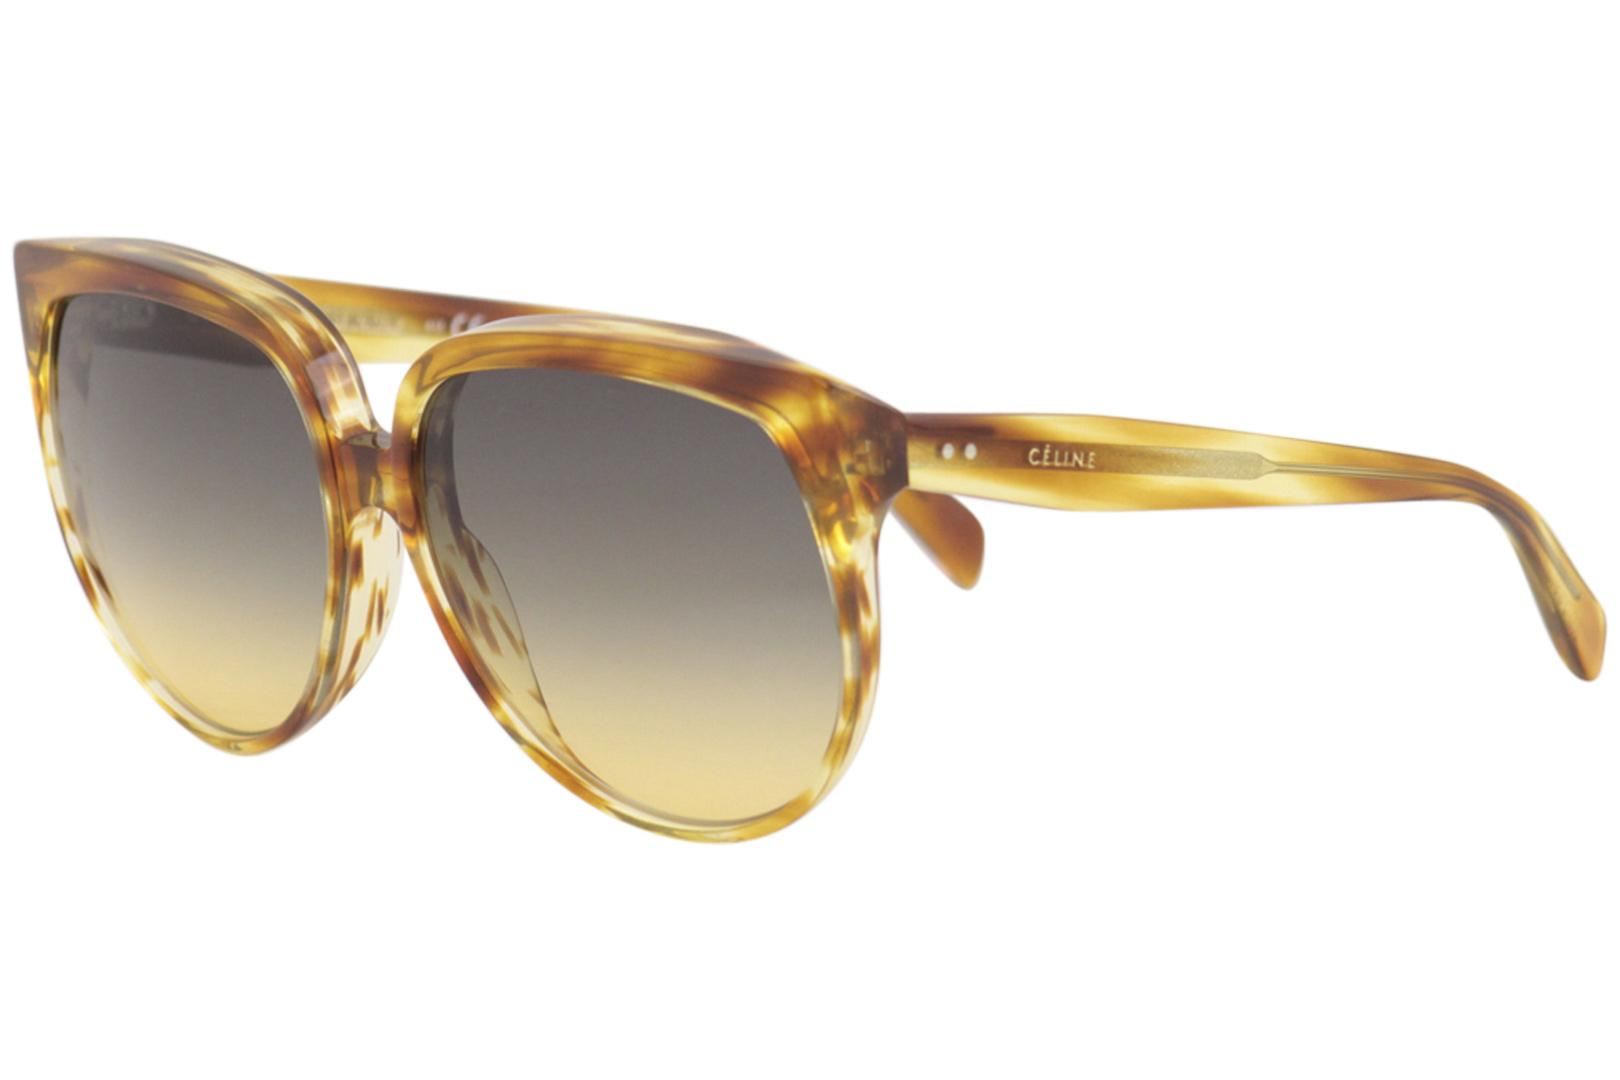 7237bef4b9c Celine Women s CL40048I CL 40048 I Fashion Square Sunglasses